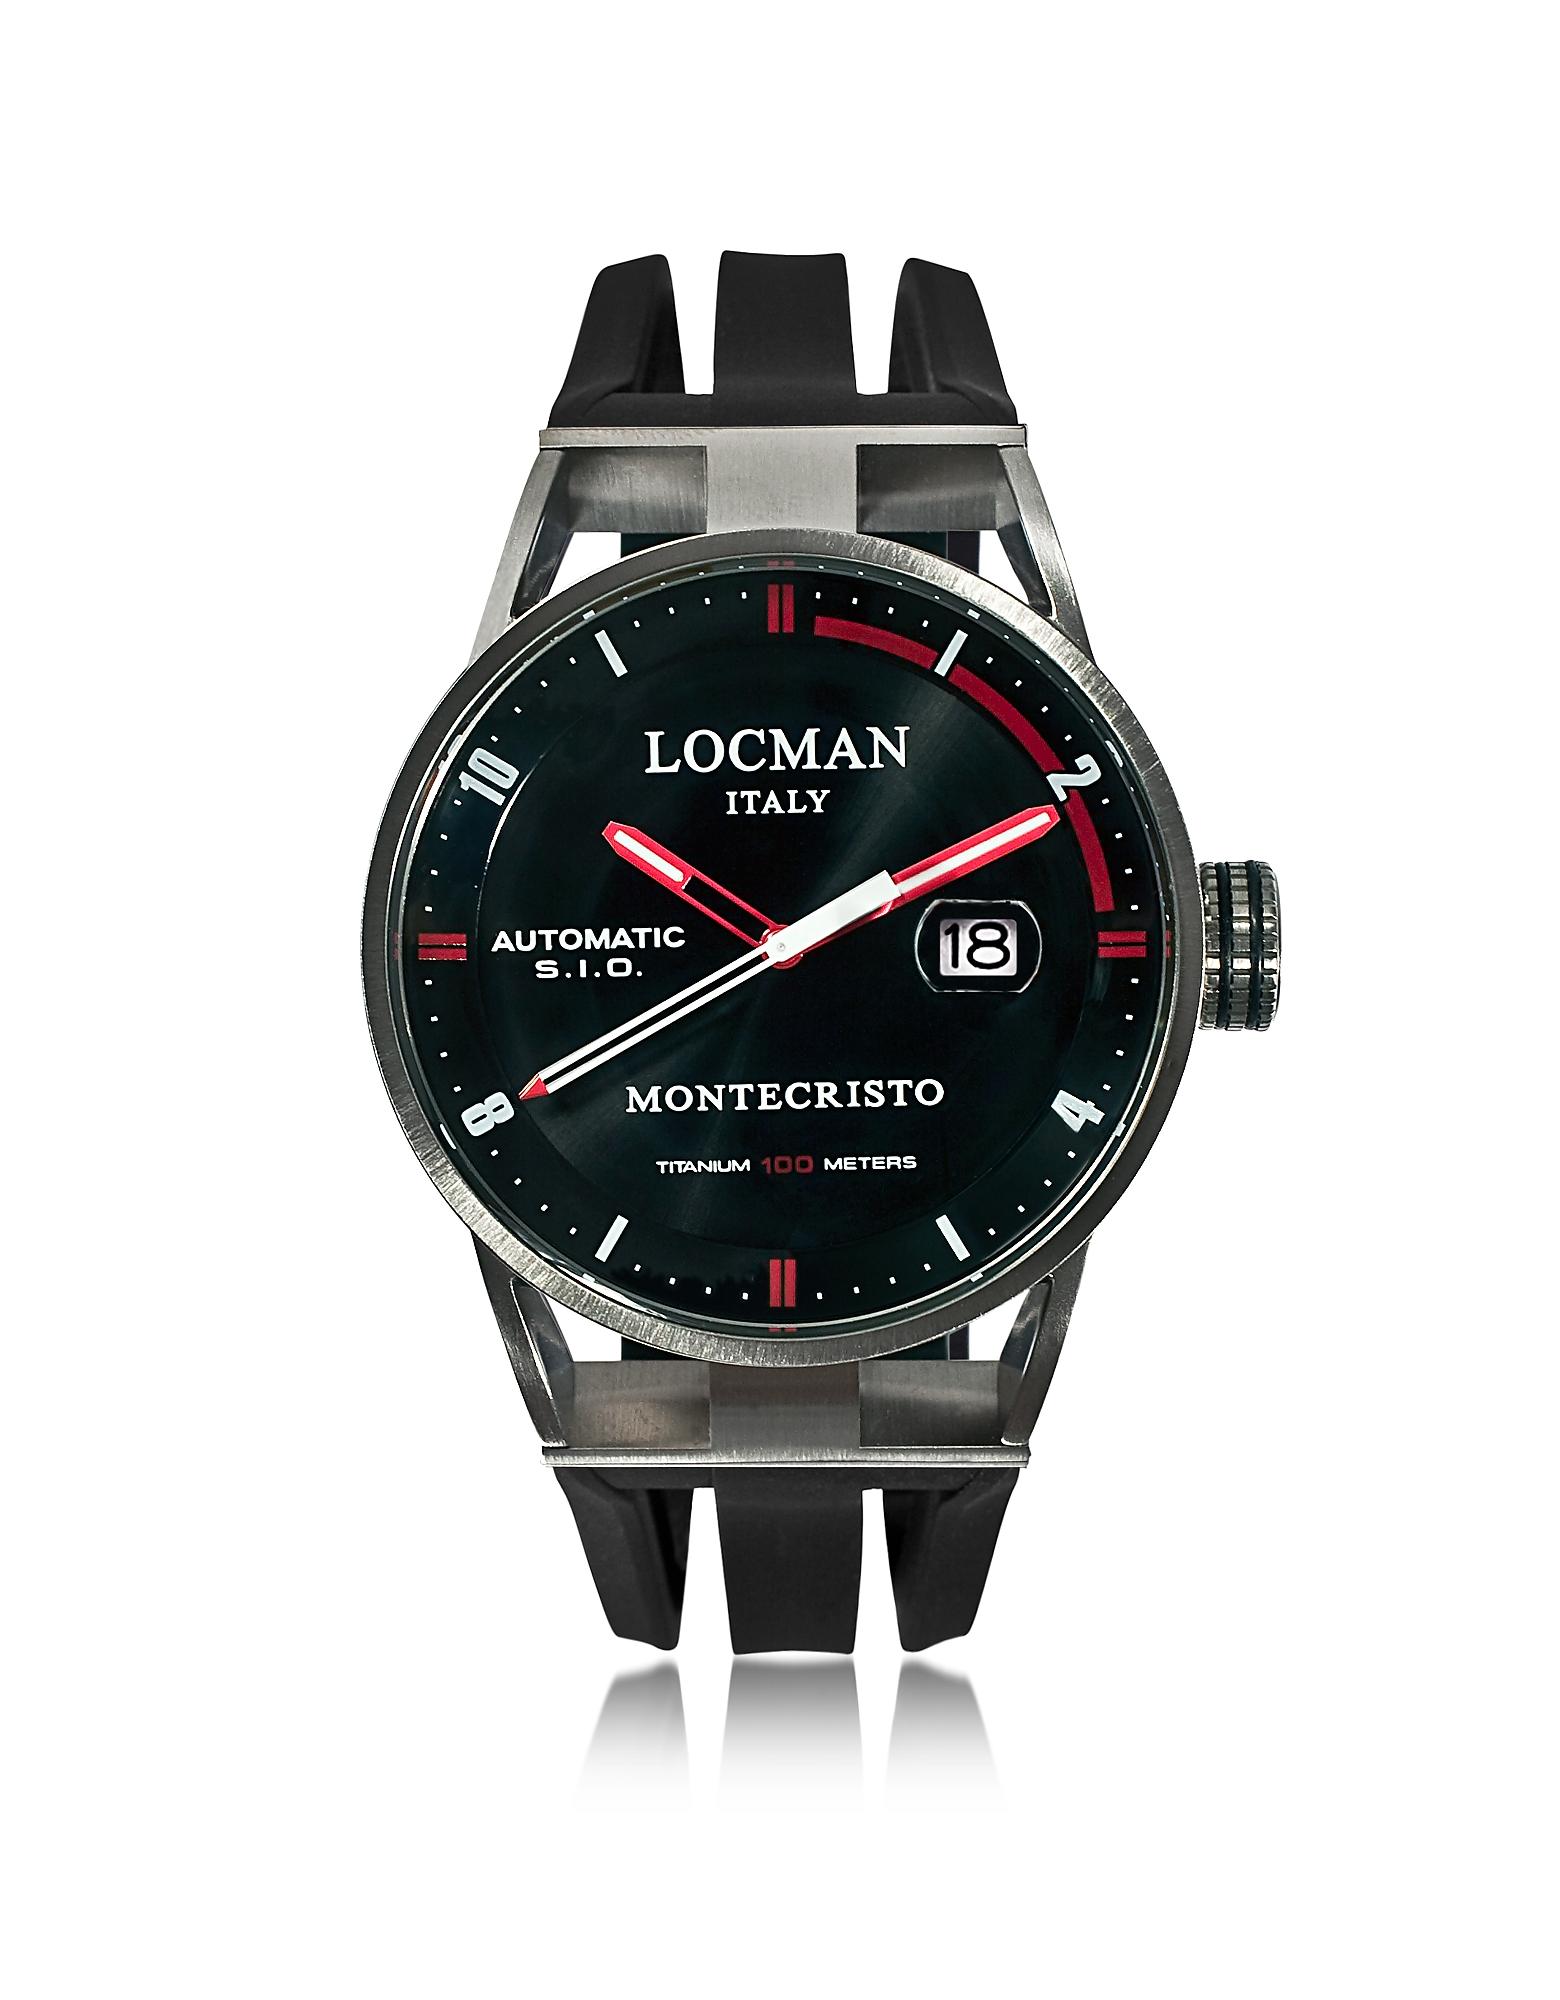 Locman Men's Watches, Montecristo Stainless Steel & Titanium Automatic Men's Watch w/Silicone Strap